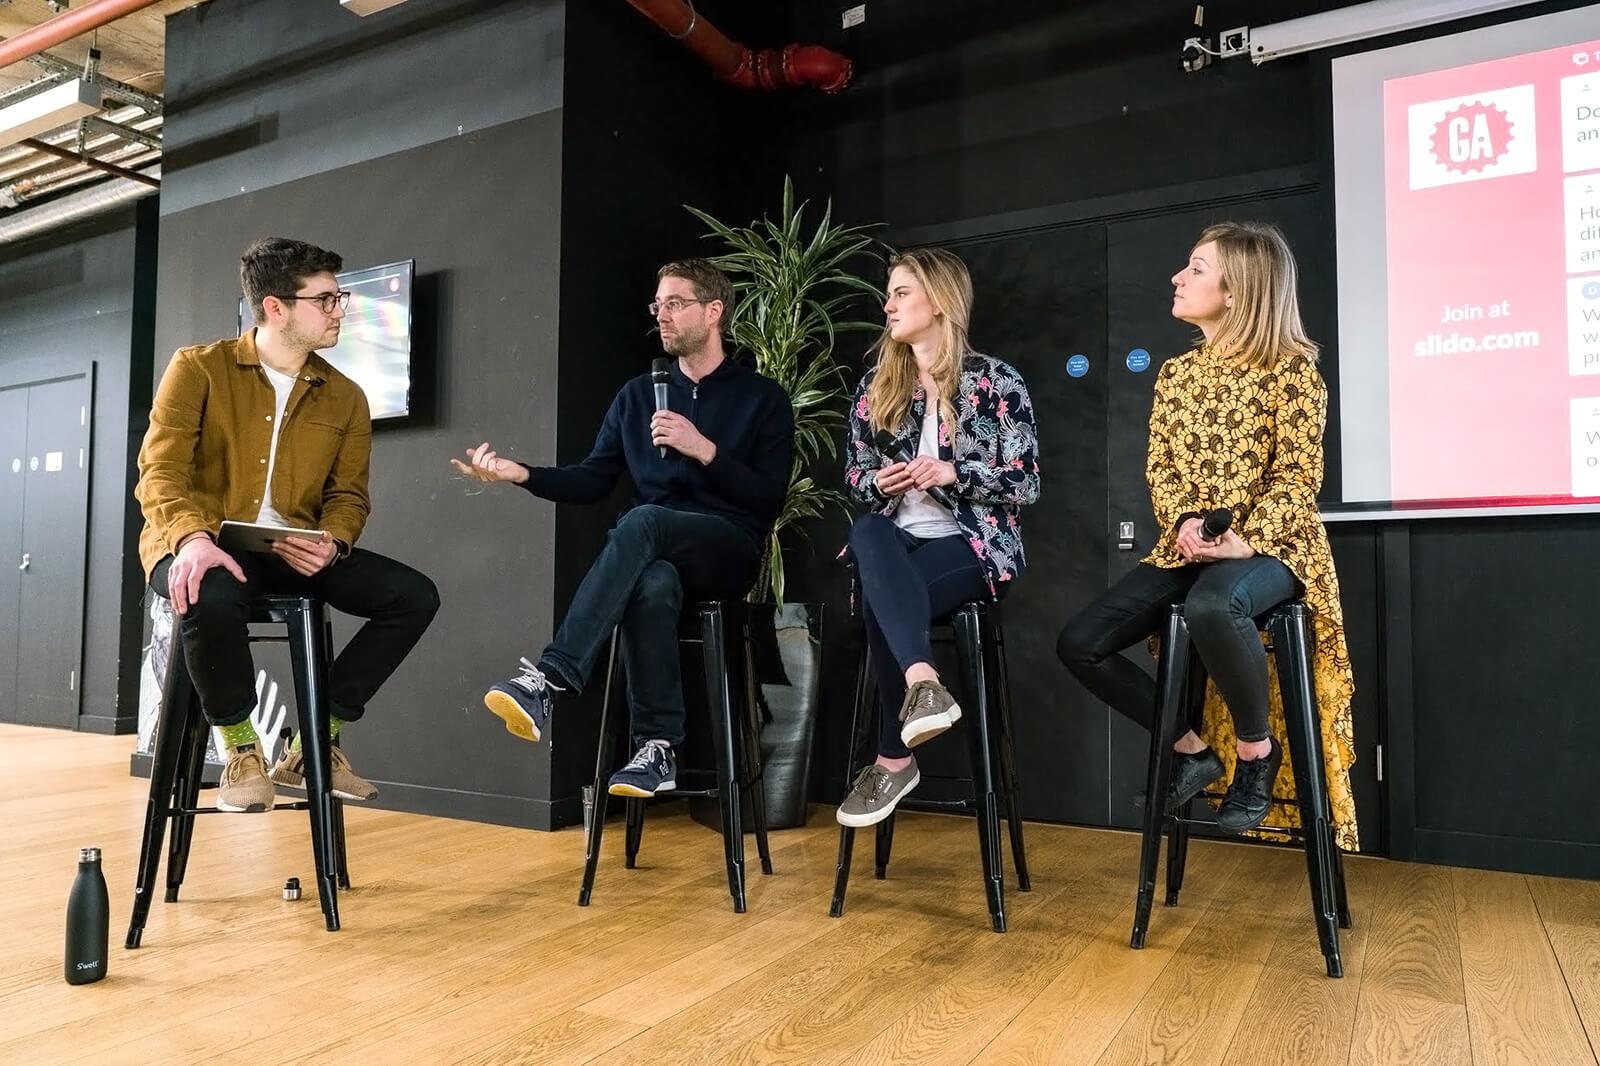 entrepreneurs in a talk at GA Seattle